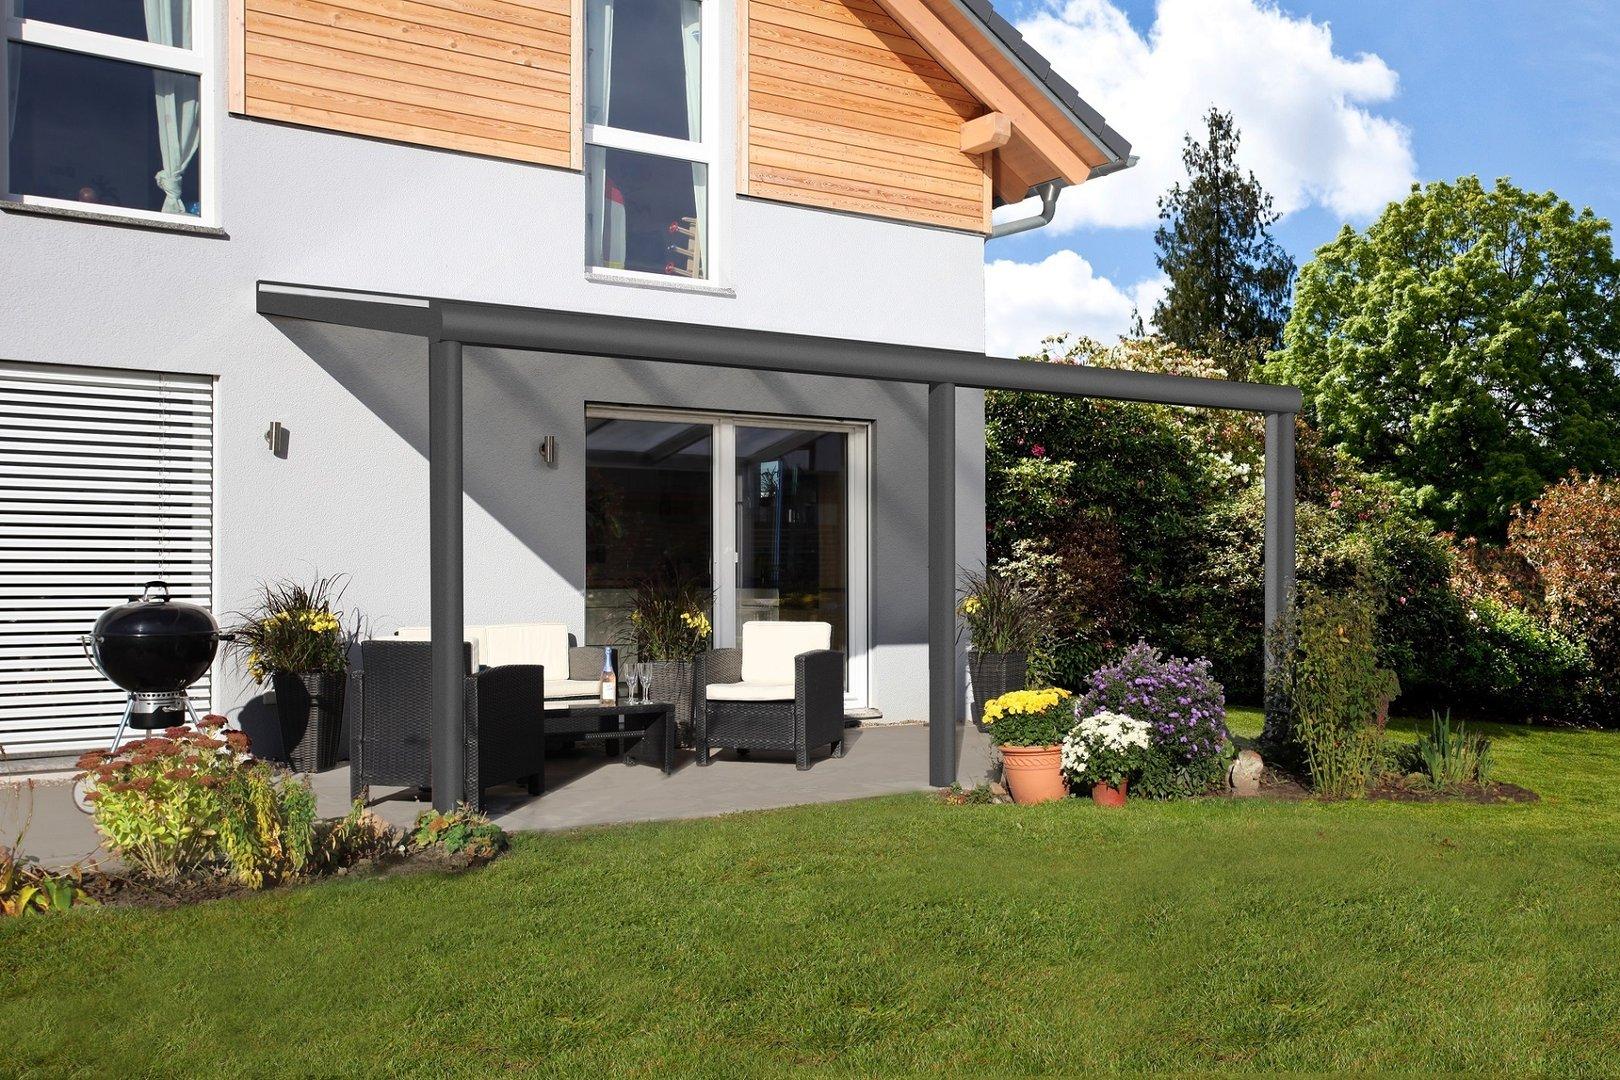 garda 8 canopy model alu garden house wood shop. Black Bedroom Furniture Sets. Home Design Ideas